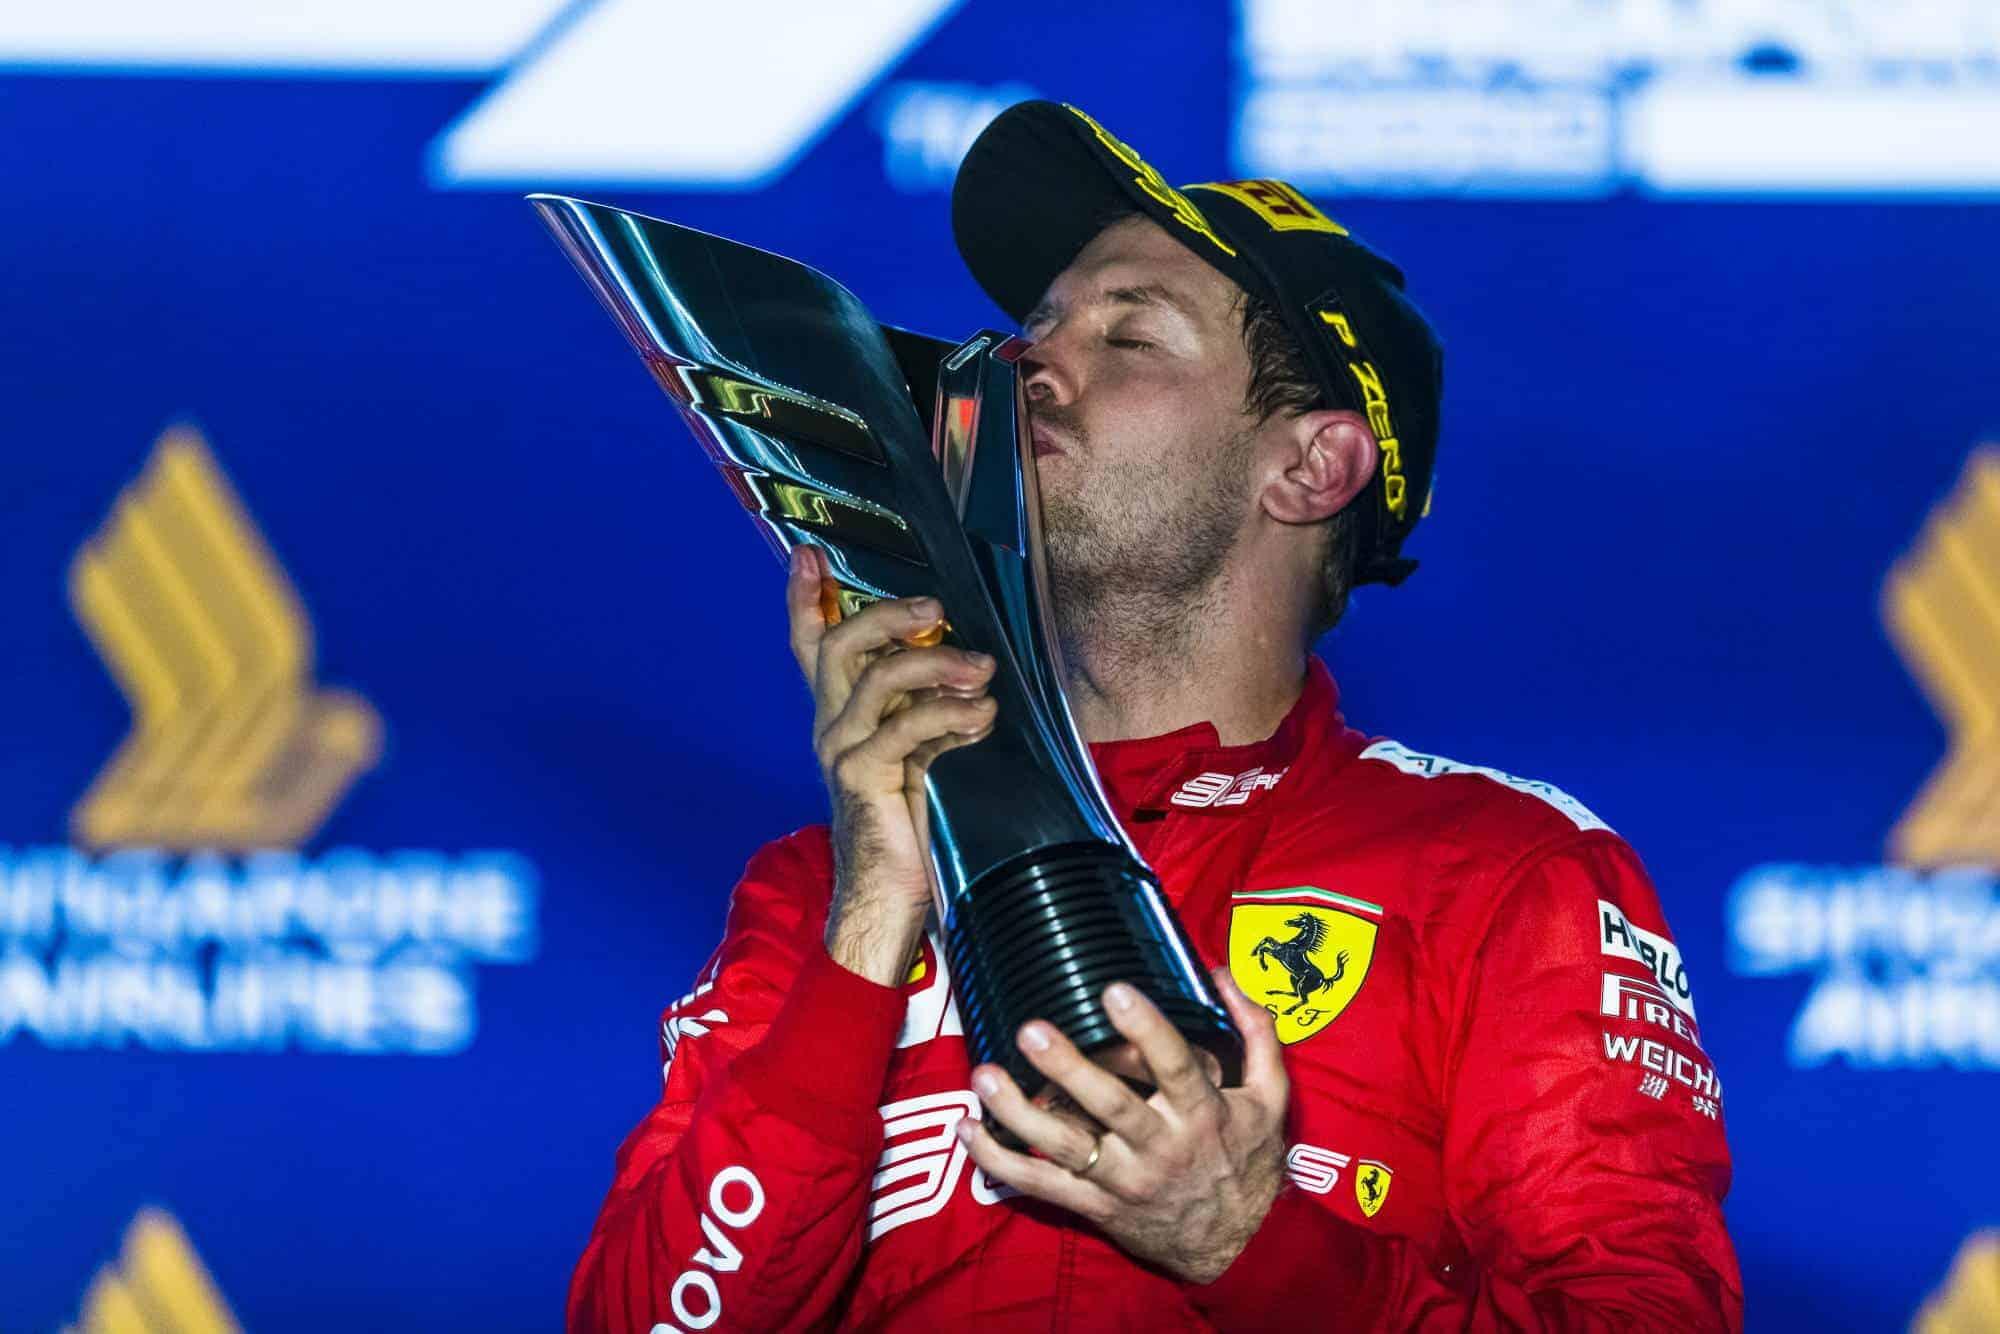 Sebastian Vettel Ferrari SF90 Singapore GP F1 2019 podium trophy victory Photo Ferrari